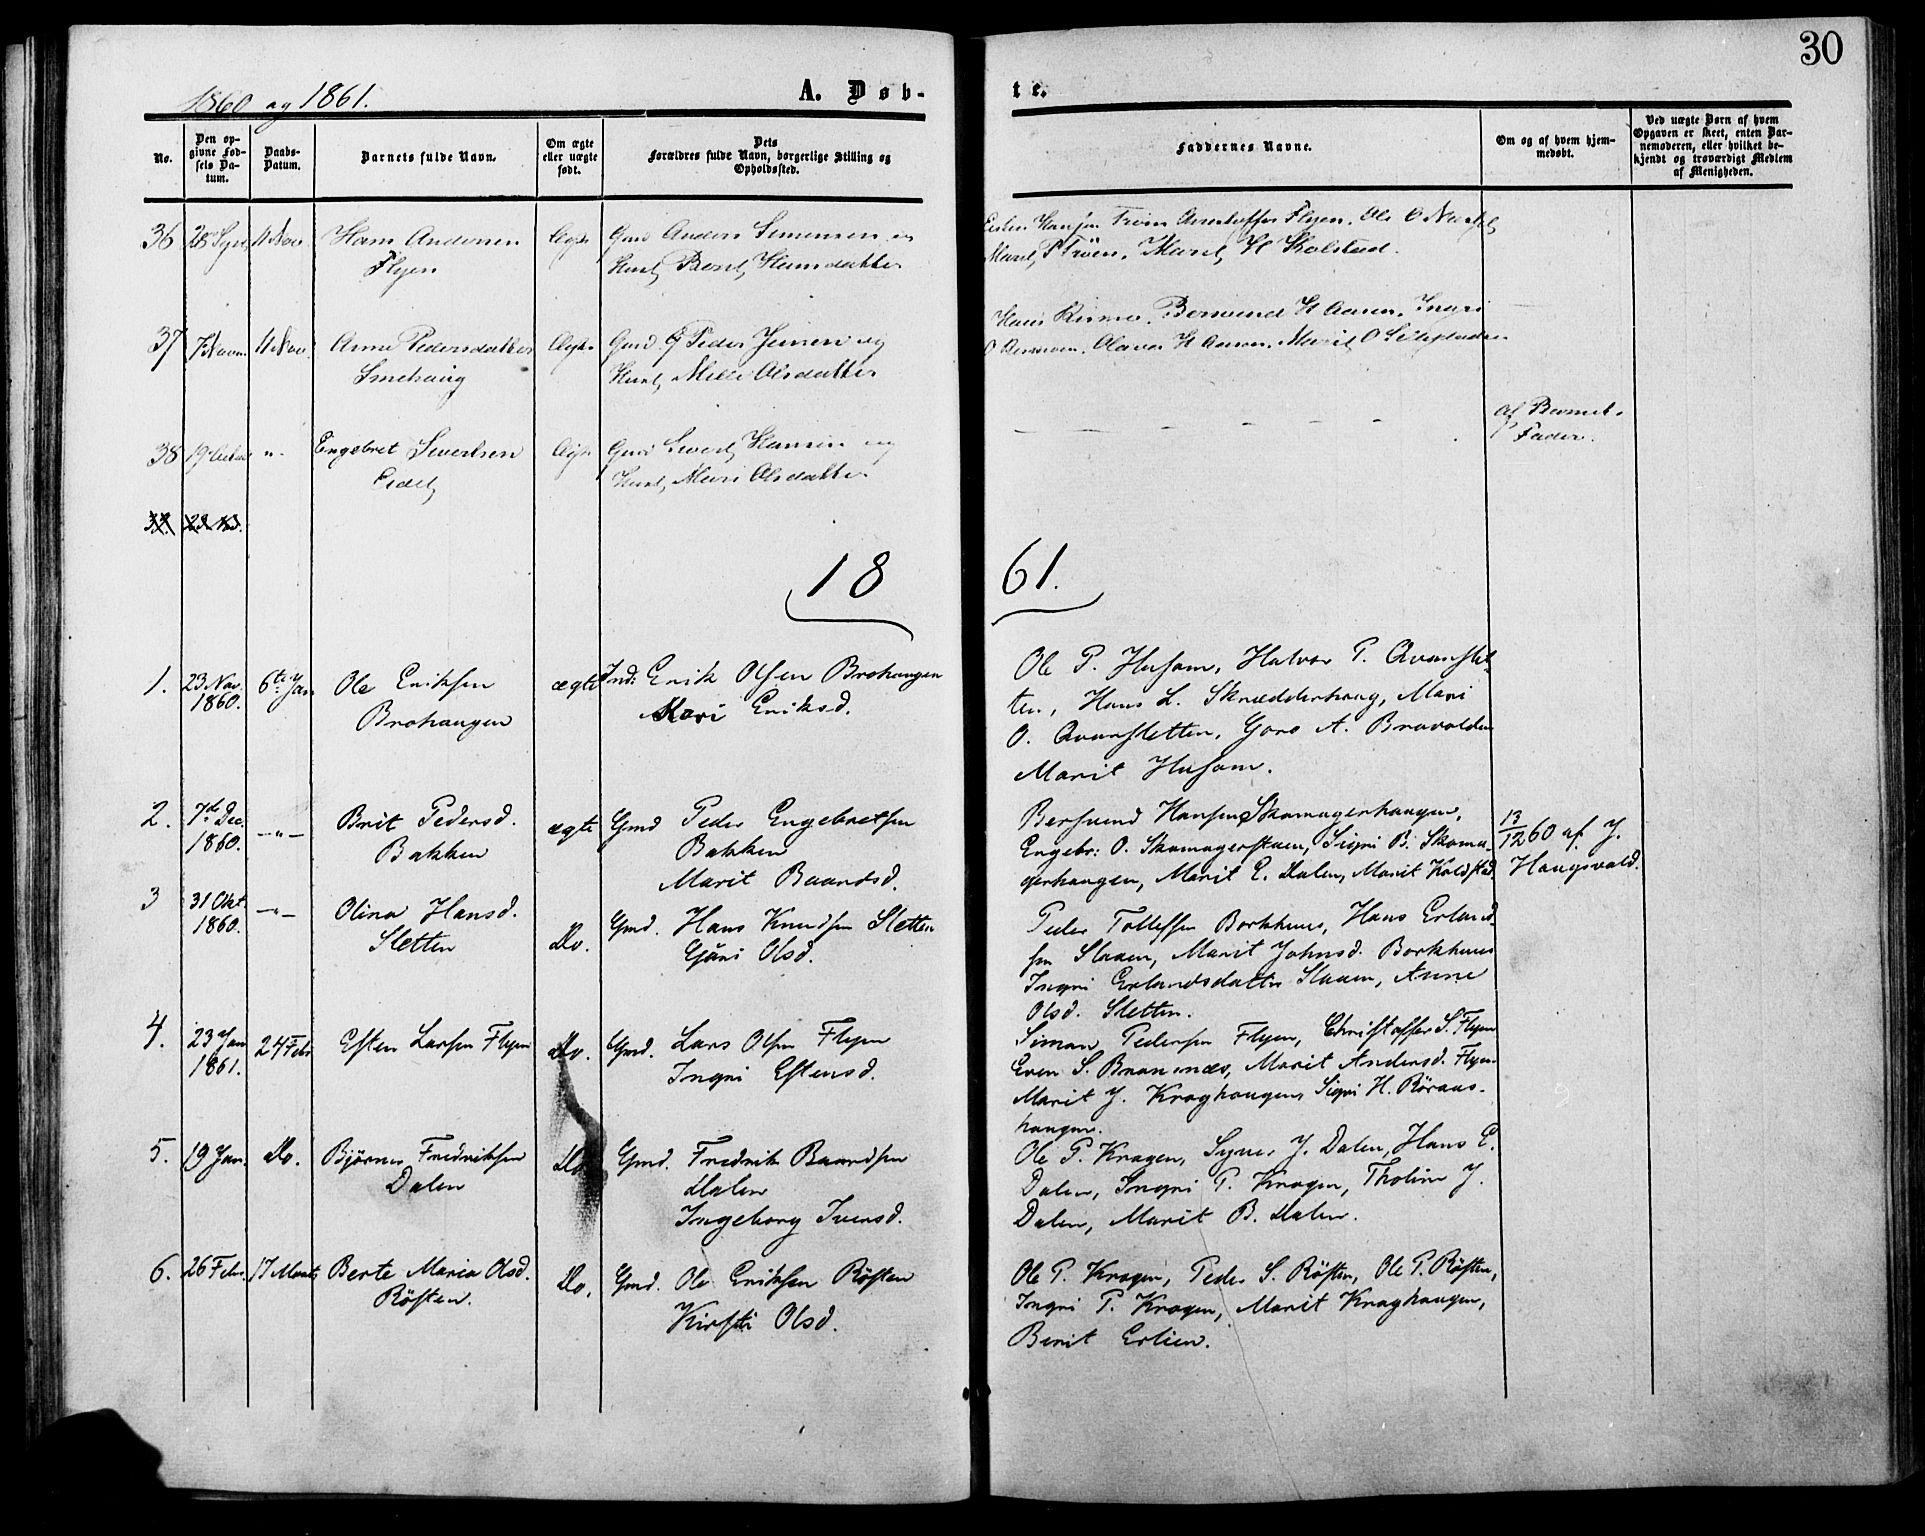 SAH, Lesja prestekontor, Ministerialbok nr. 7, 1854-1862, s. 30